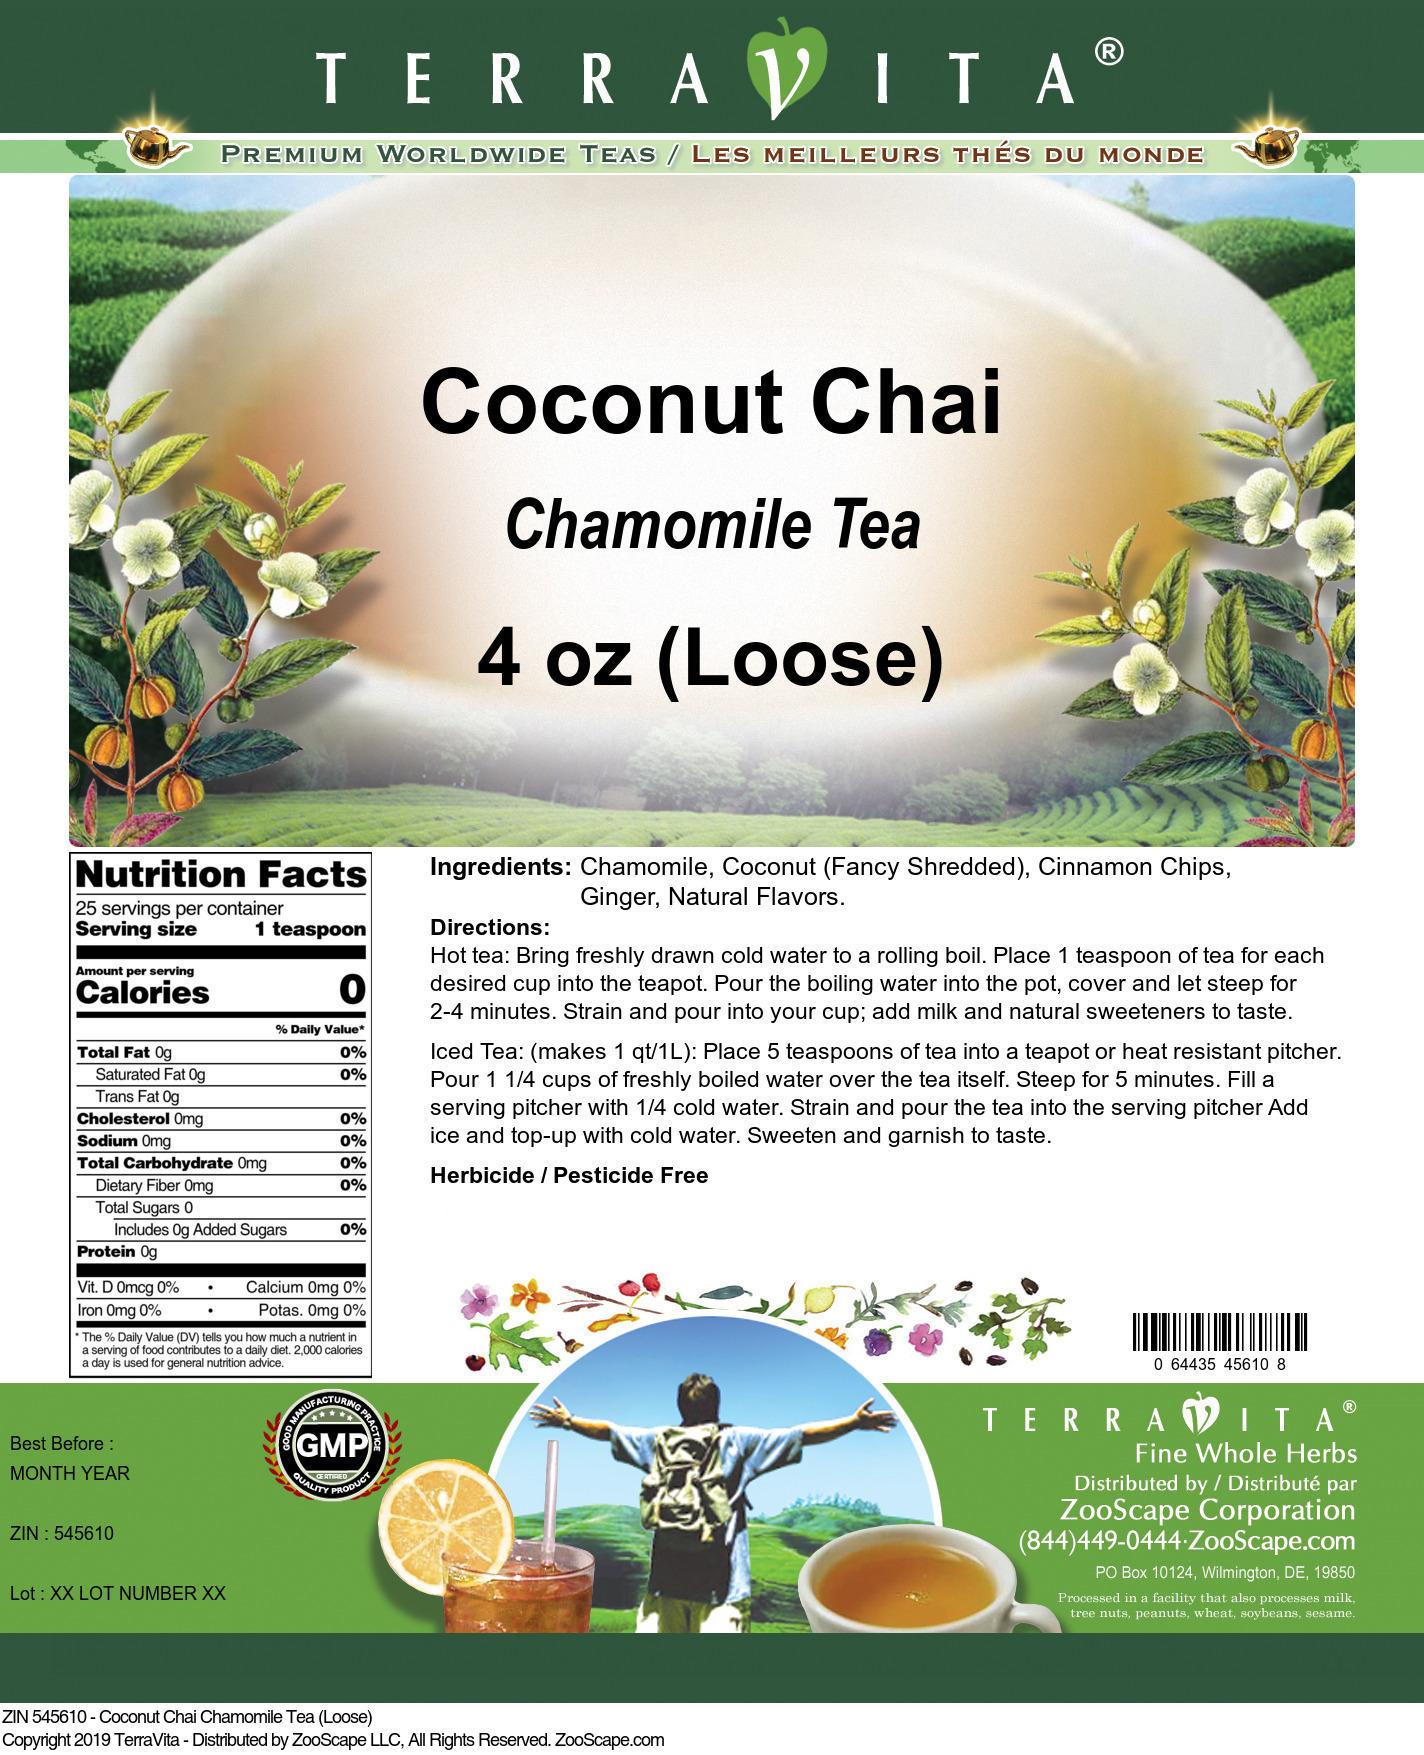 Coconut Chai Chamomile Tea (Loose)